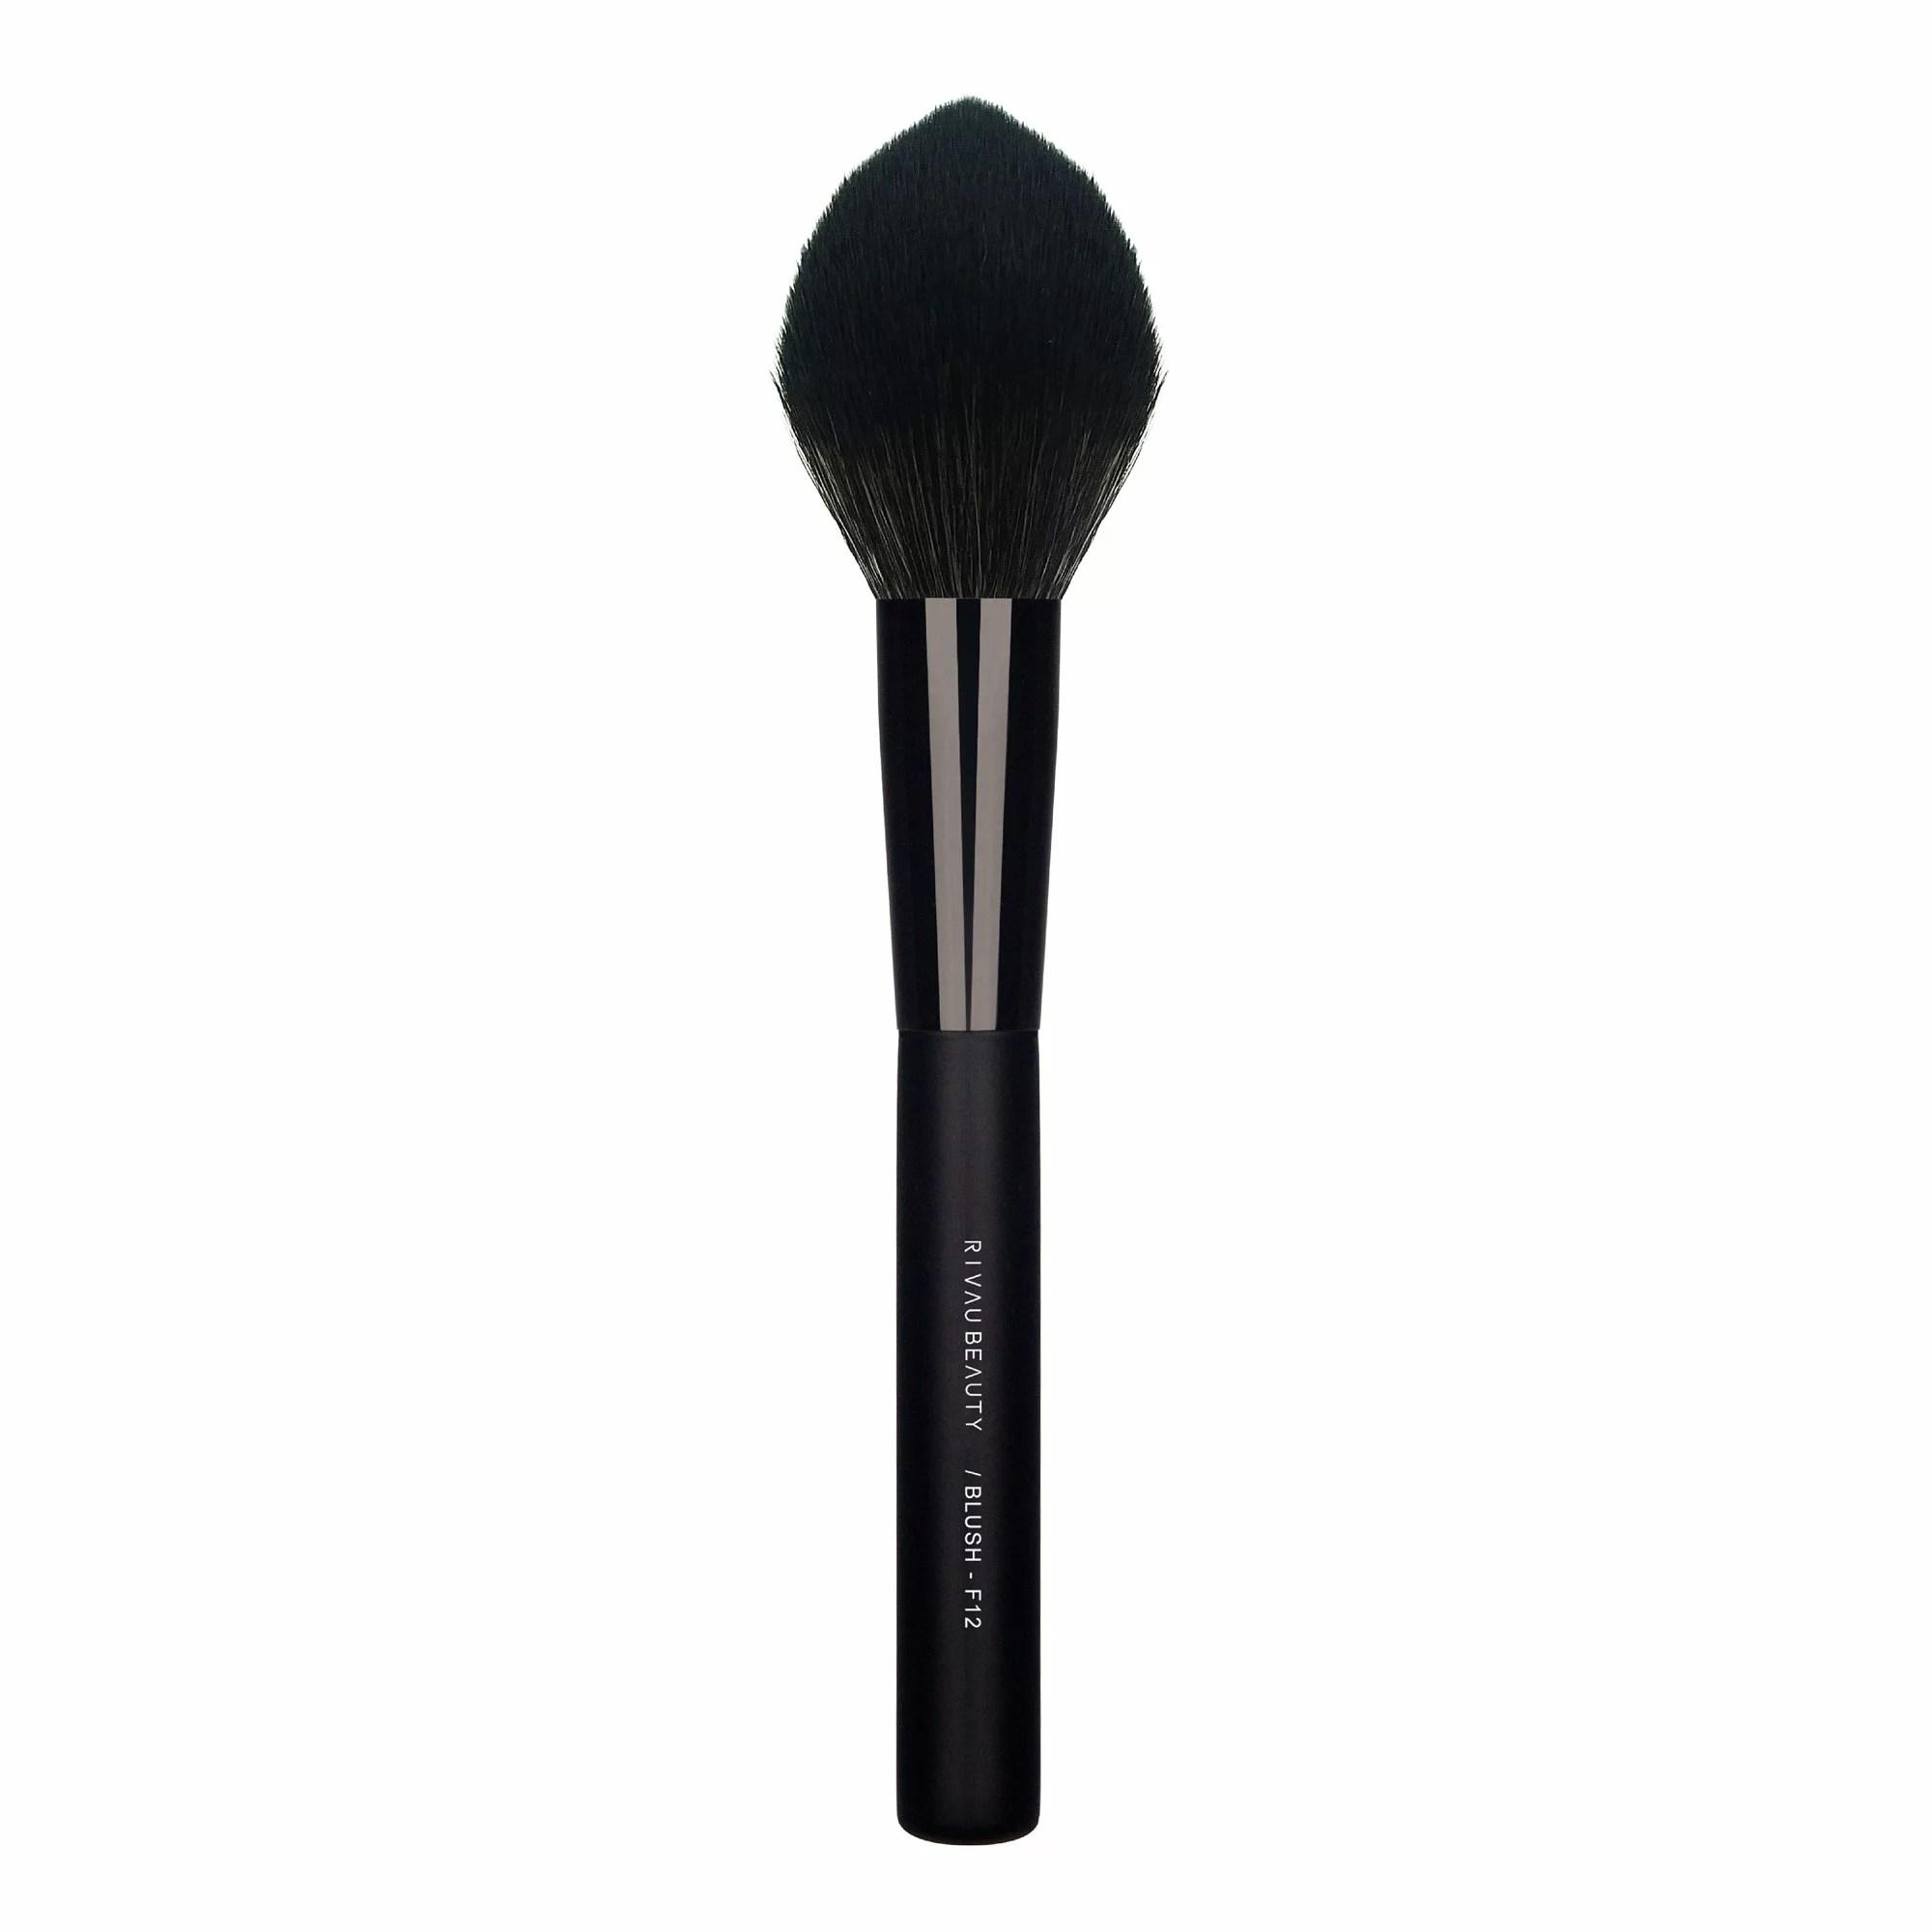 F12 腮紅刷 - 黑色系列 / 可當蜜粉刷 化妝刷 刷具 美妝 工具 IG 網紅 推薦 禮物   RivauBeauty - Rakuten樂天市場